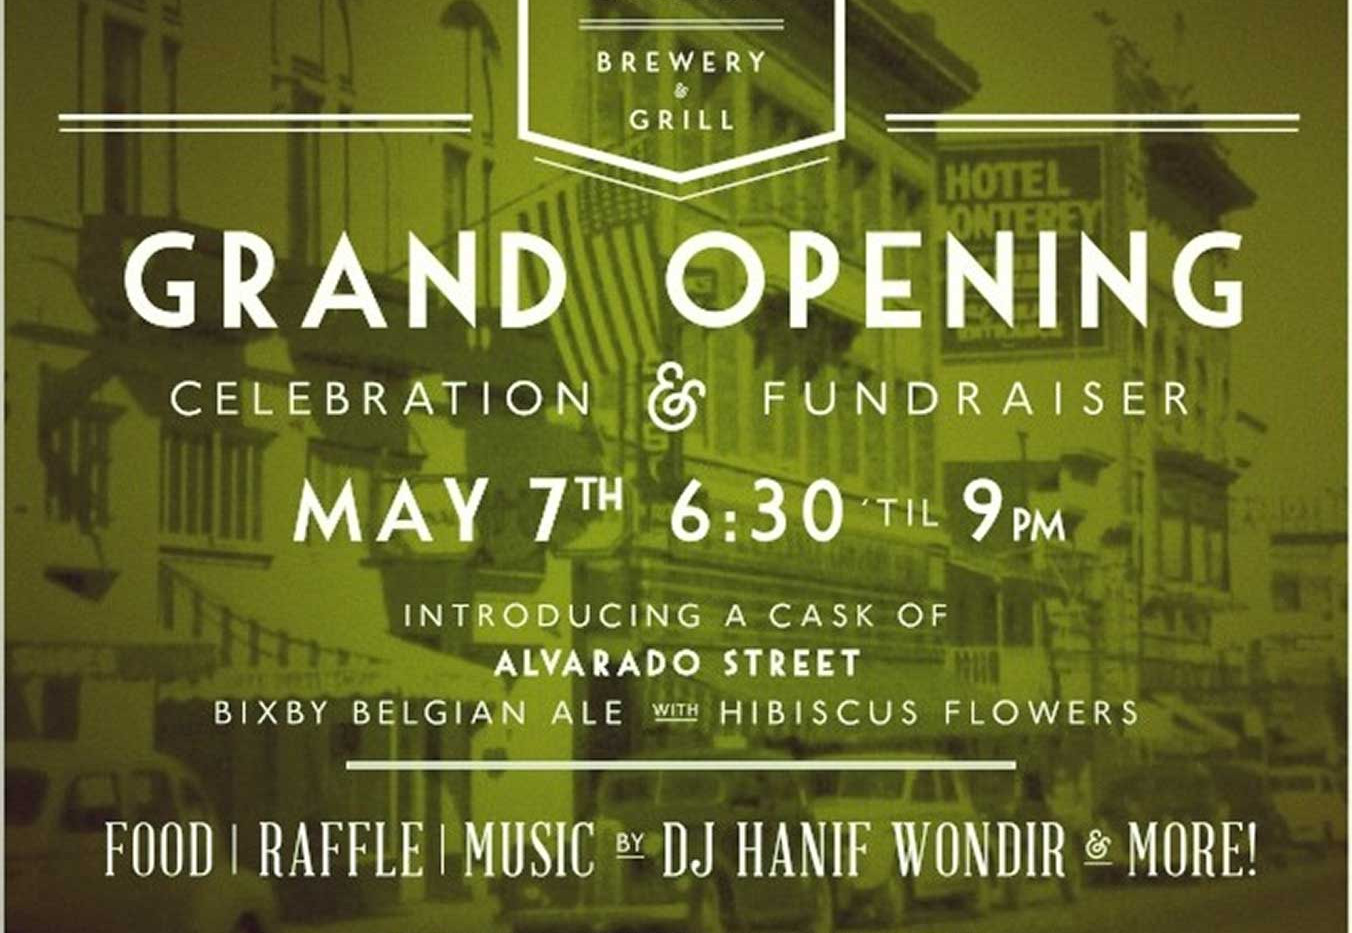 Alvarado Street Brewery Grand Opening Fl